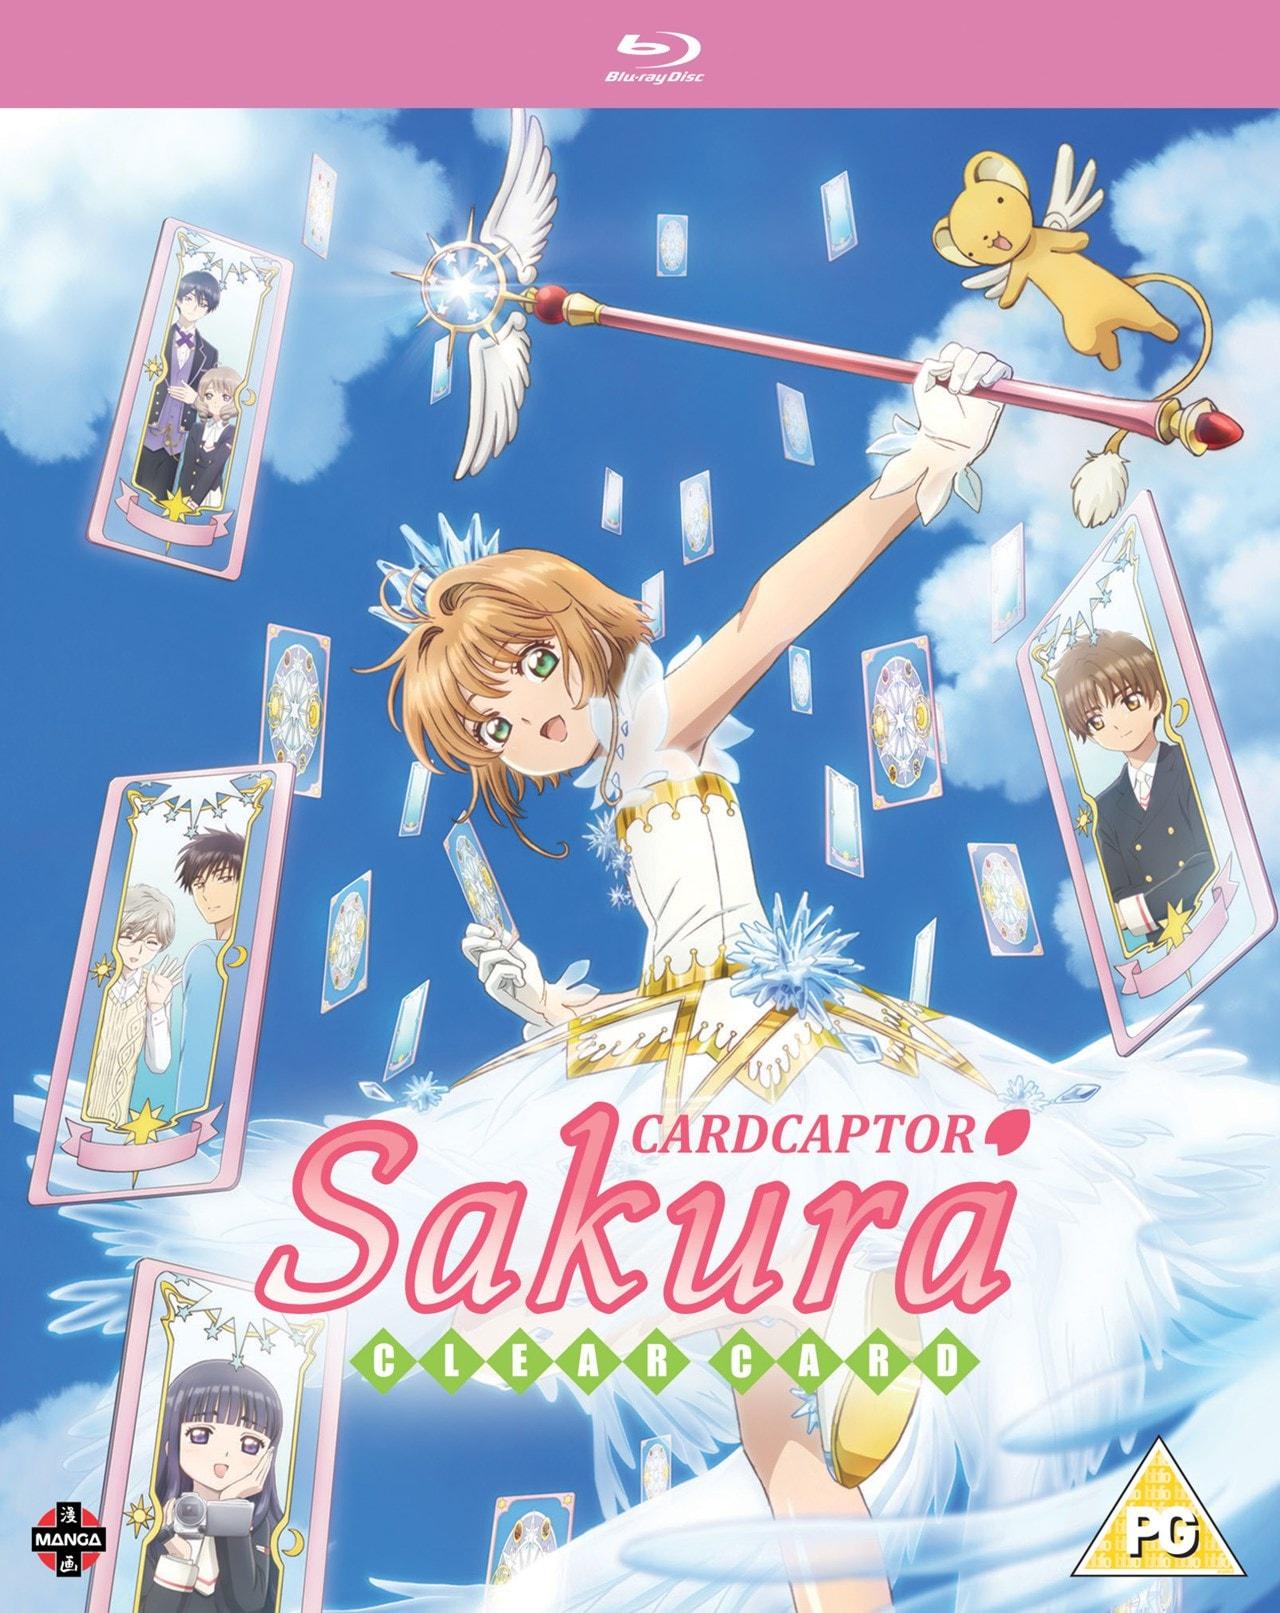 Cardcaptor Sakura: Clear Card - 1